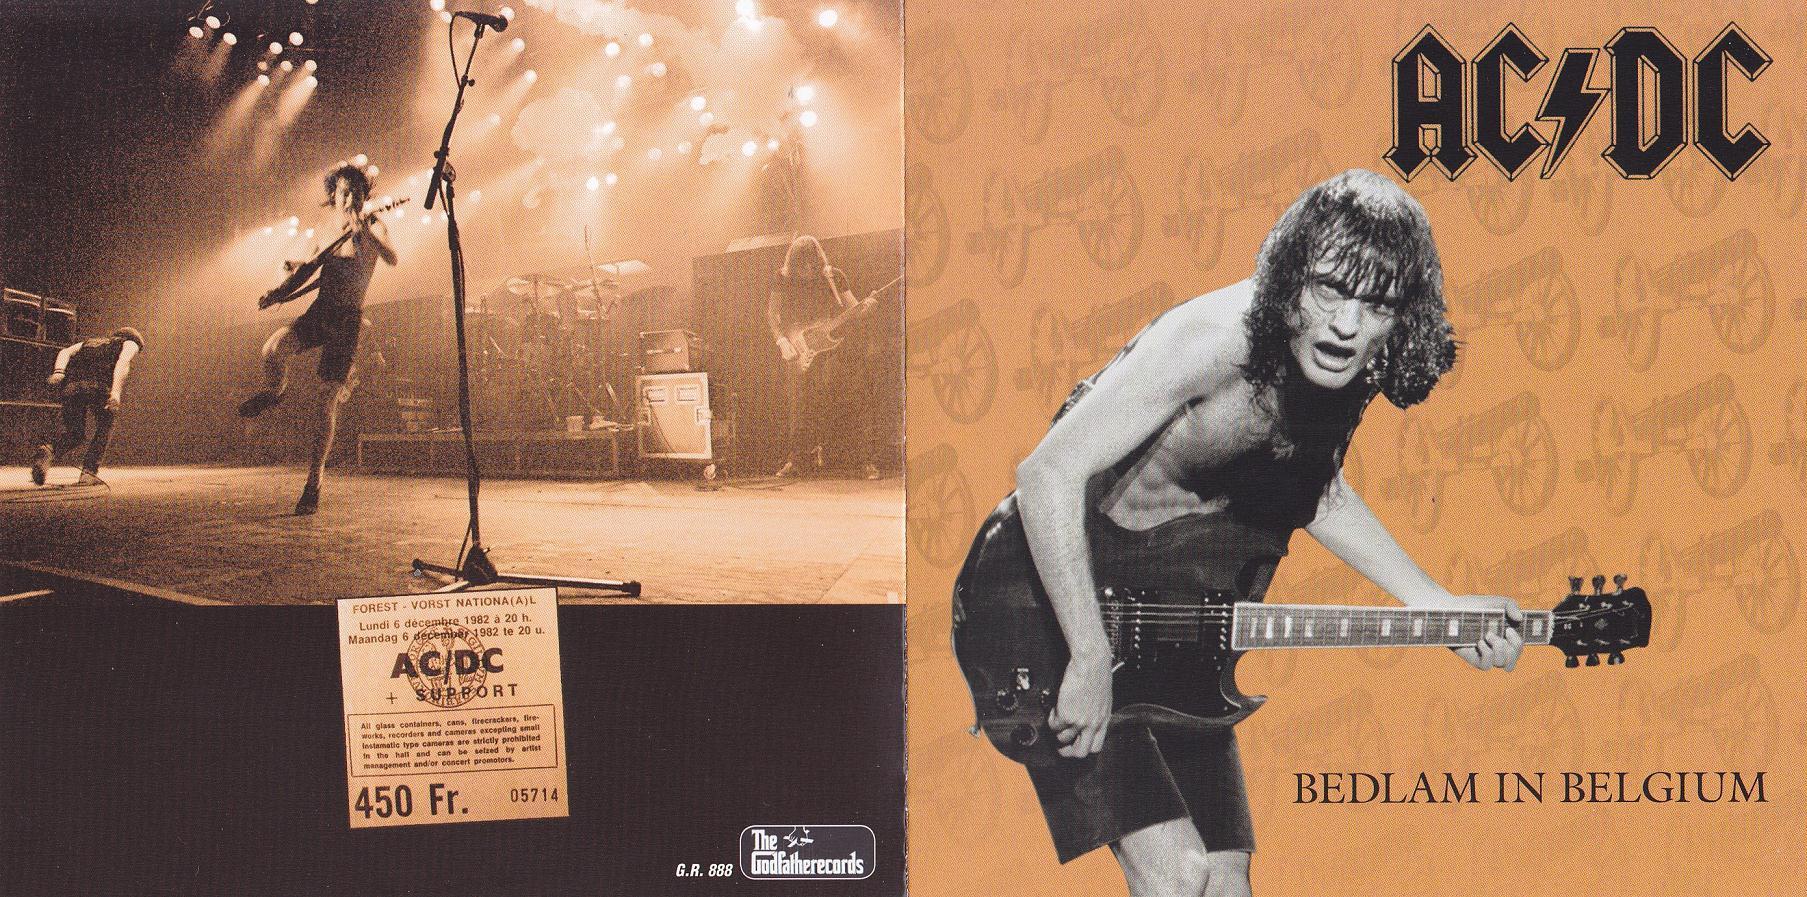 http://ace-bootlegs.com/wp-content/uploads/BOOTLEGS%20ARTWORK/AC-DC/1982-12-06-BEDLAM_IN_BELGIUM-Front.jpg